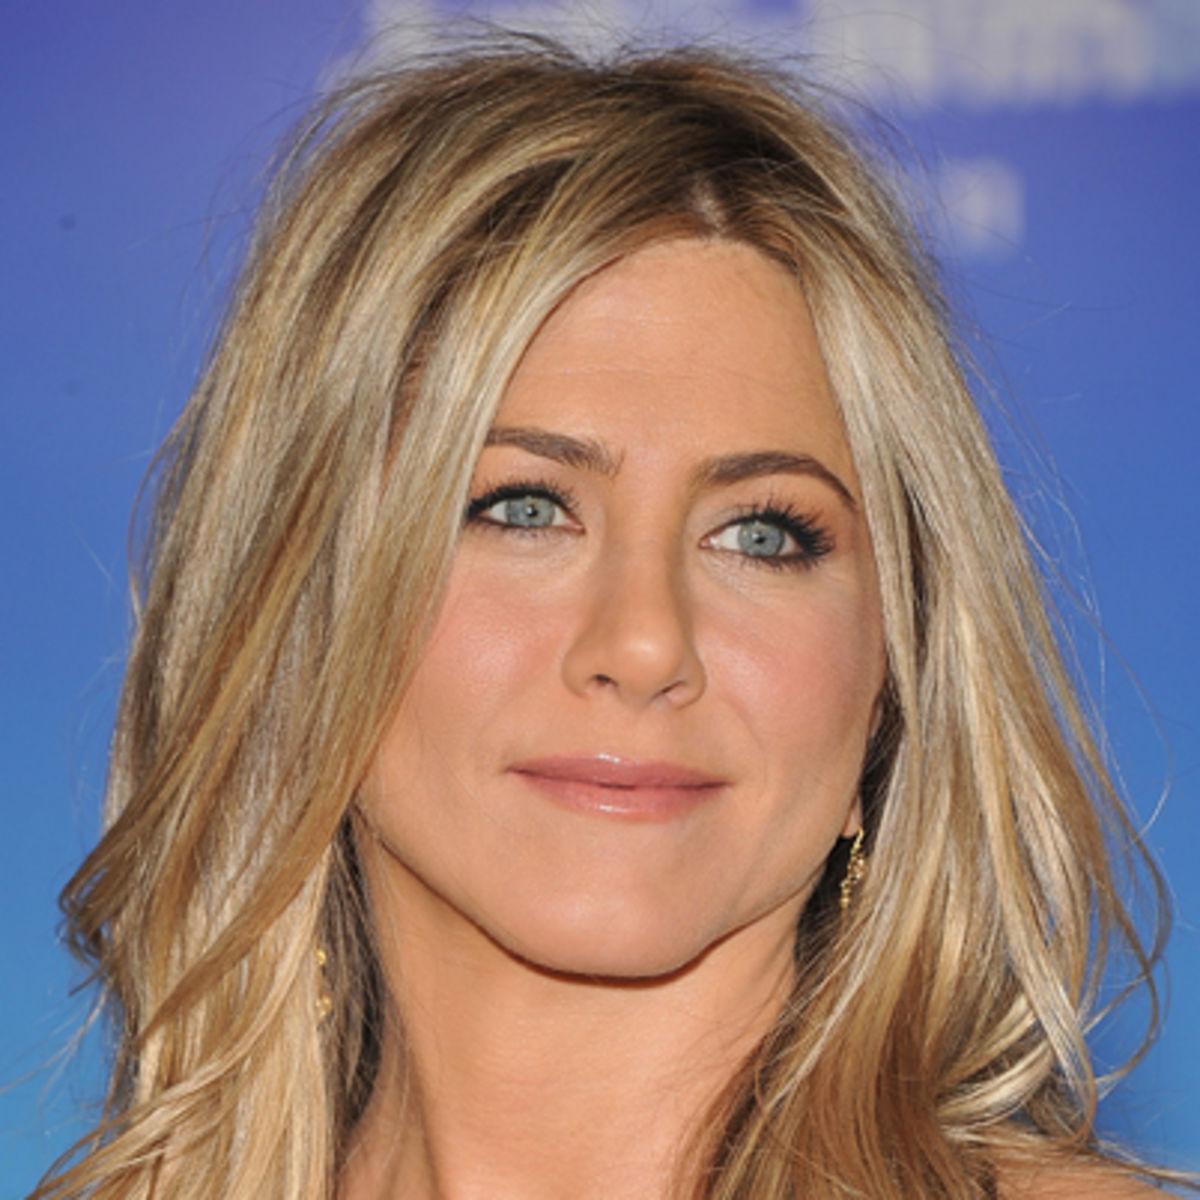 Jennifer Aniston Backgrounds, Compatible - PC, Mobile, Gadgets| 1200x1200 px